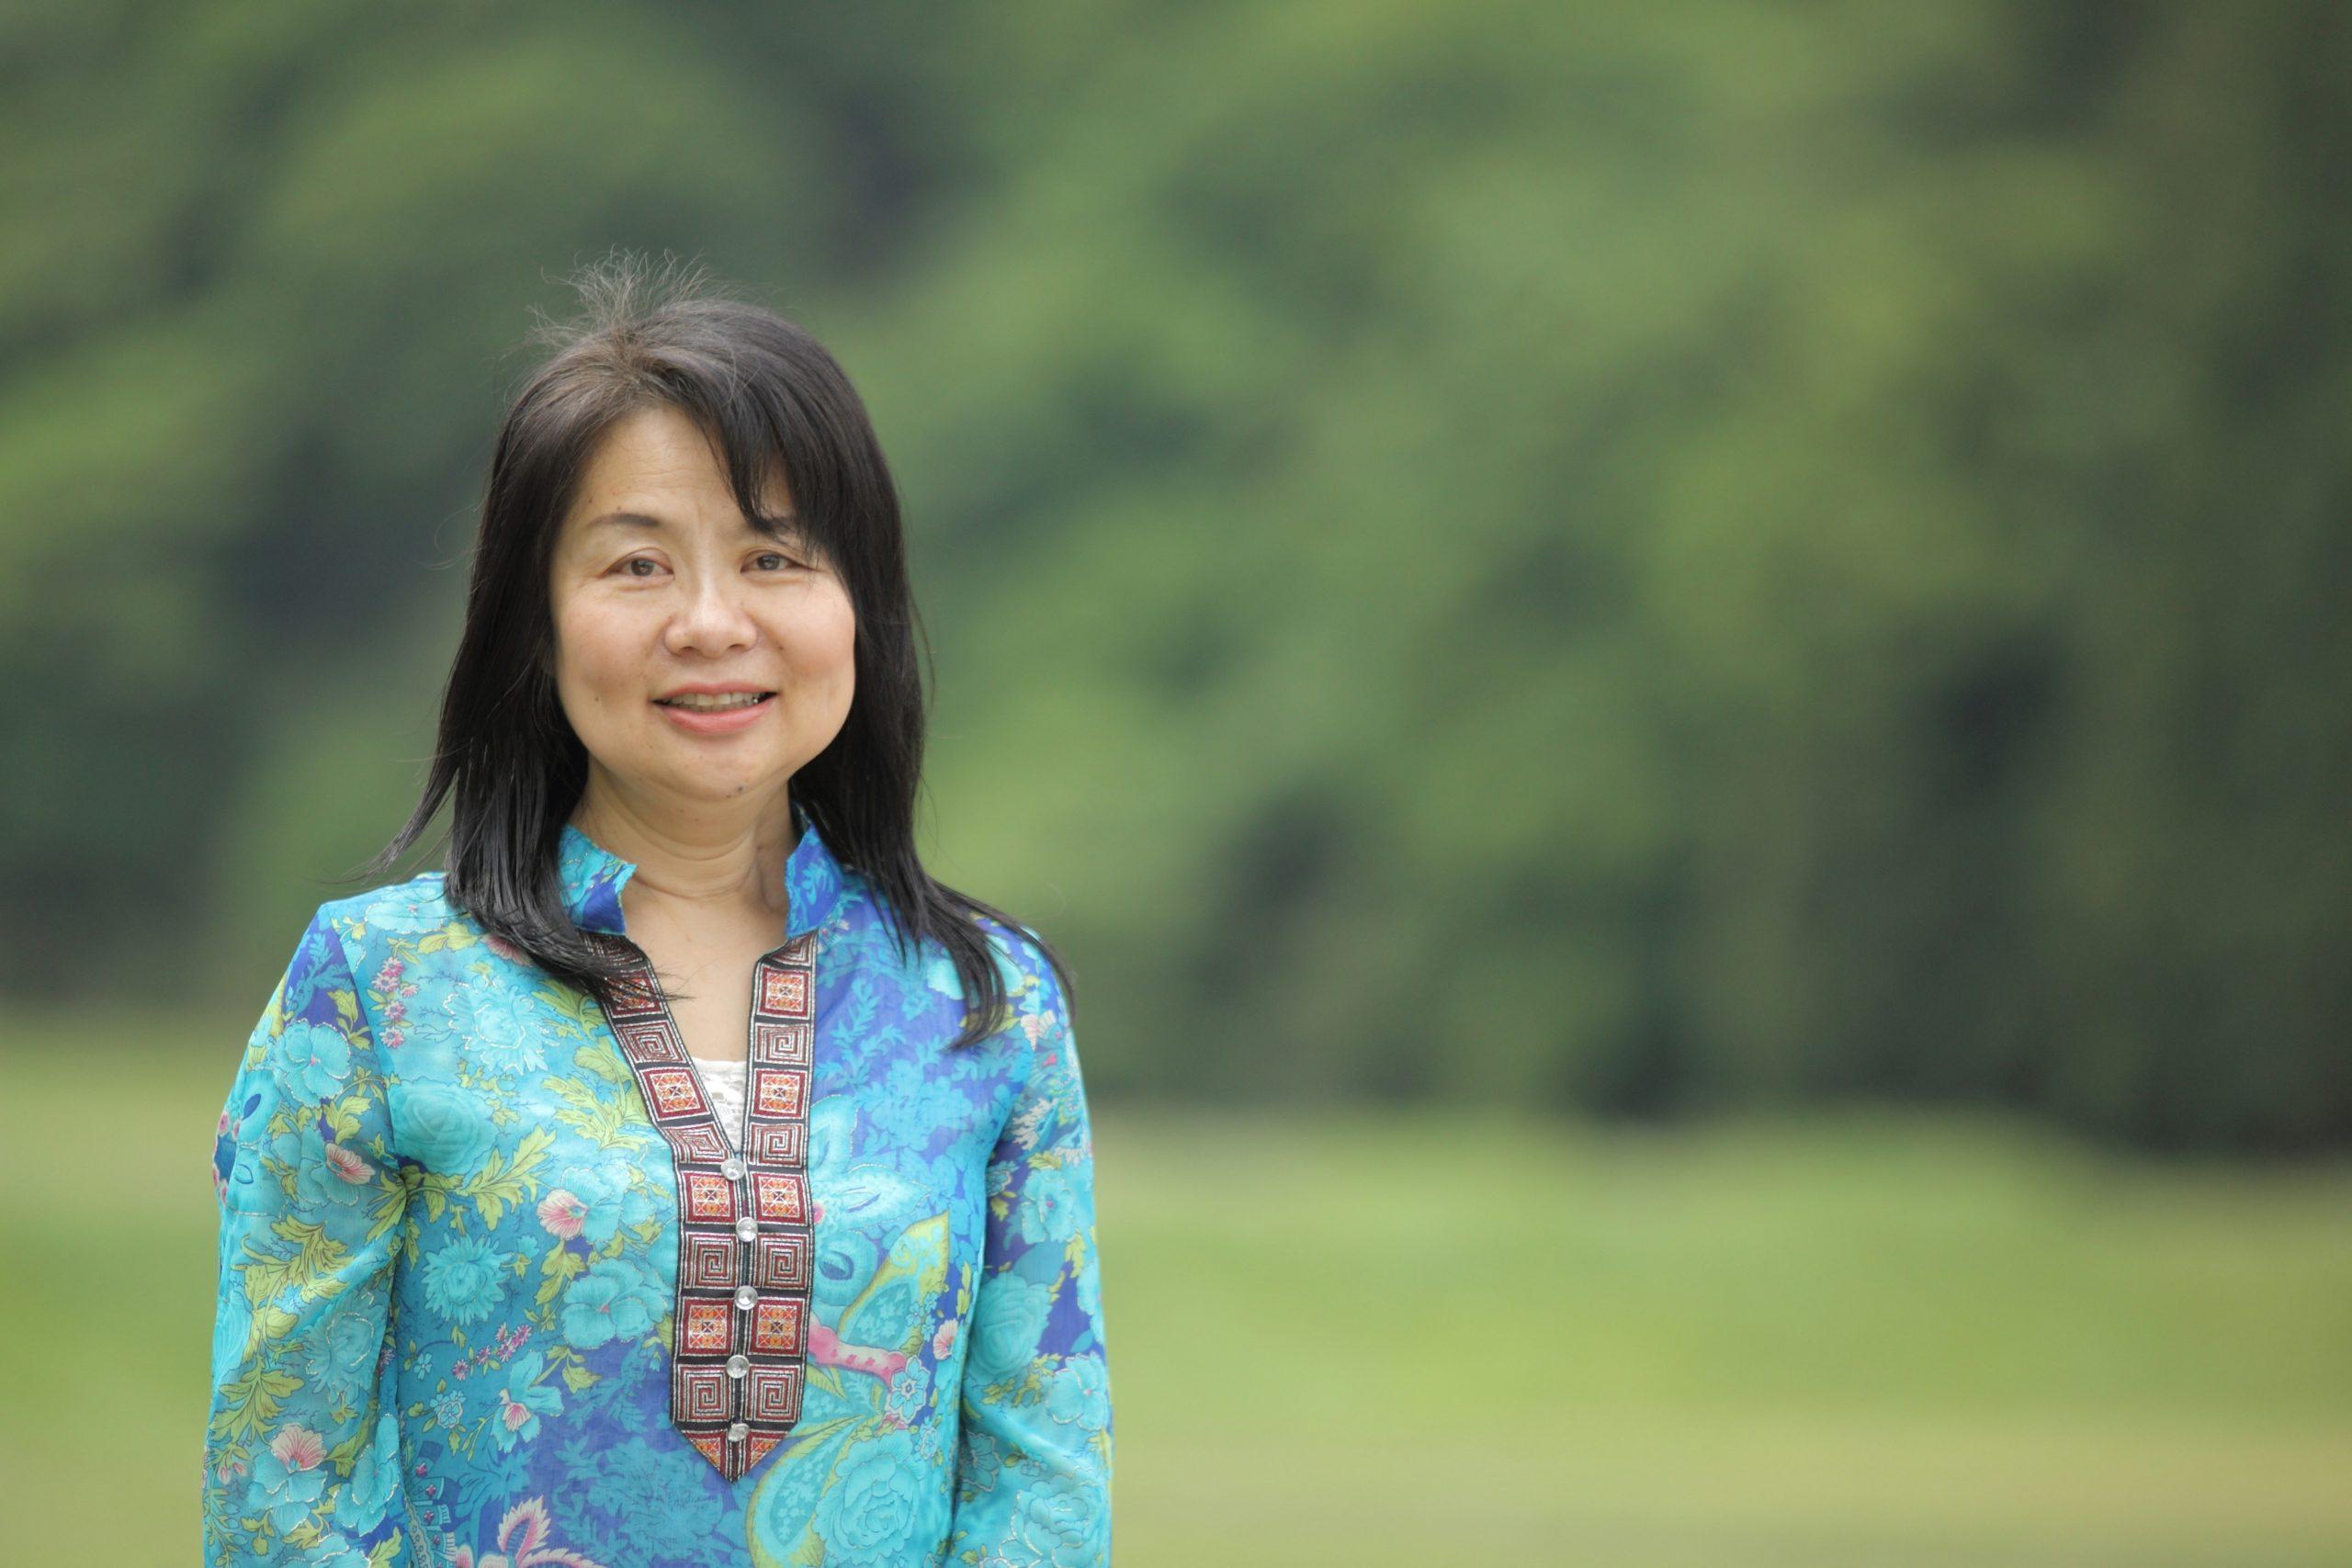 中田裕美 Hiromi Nakata